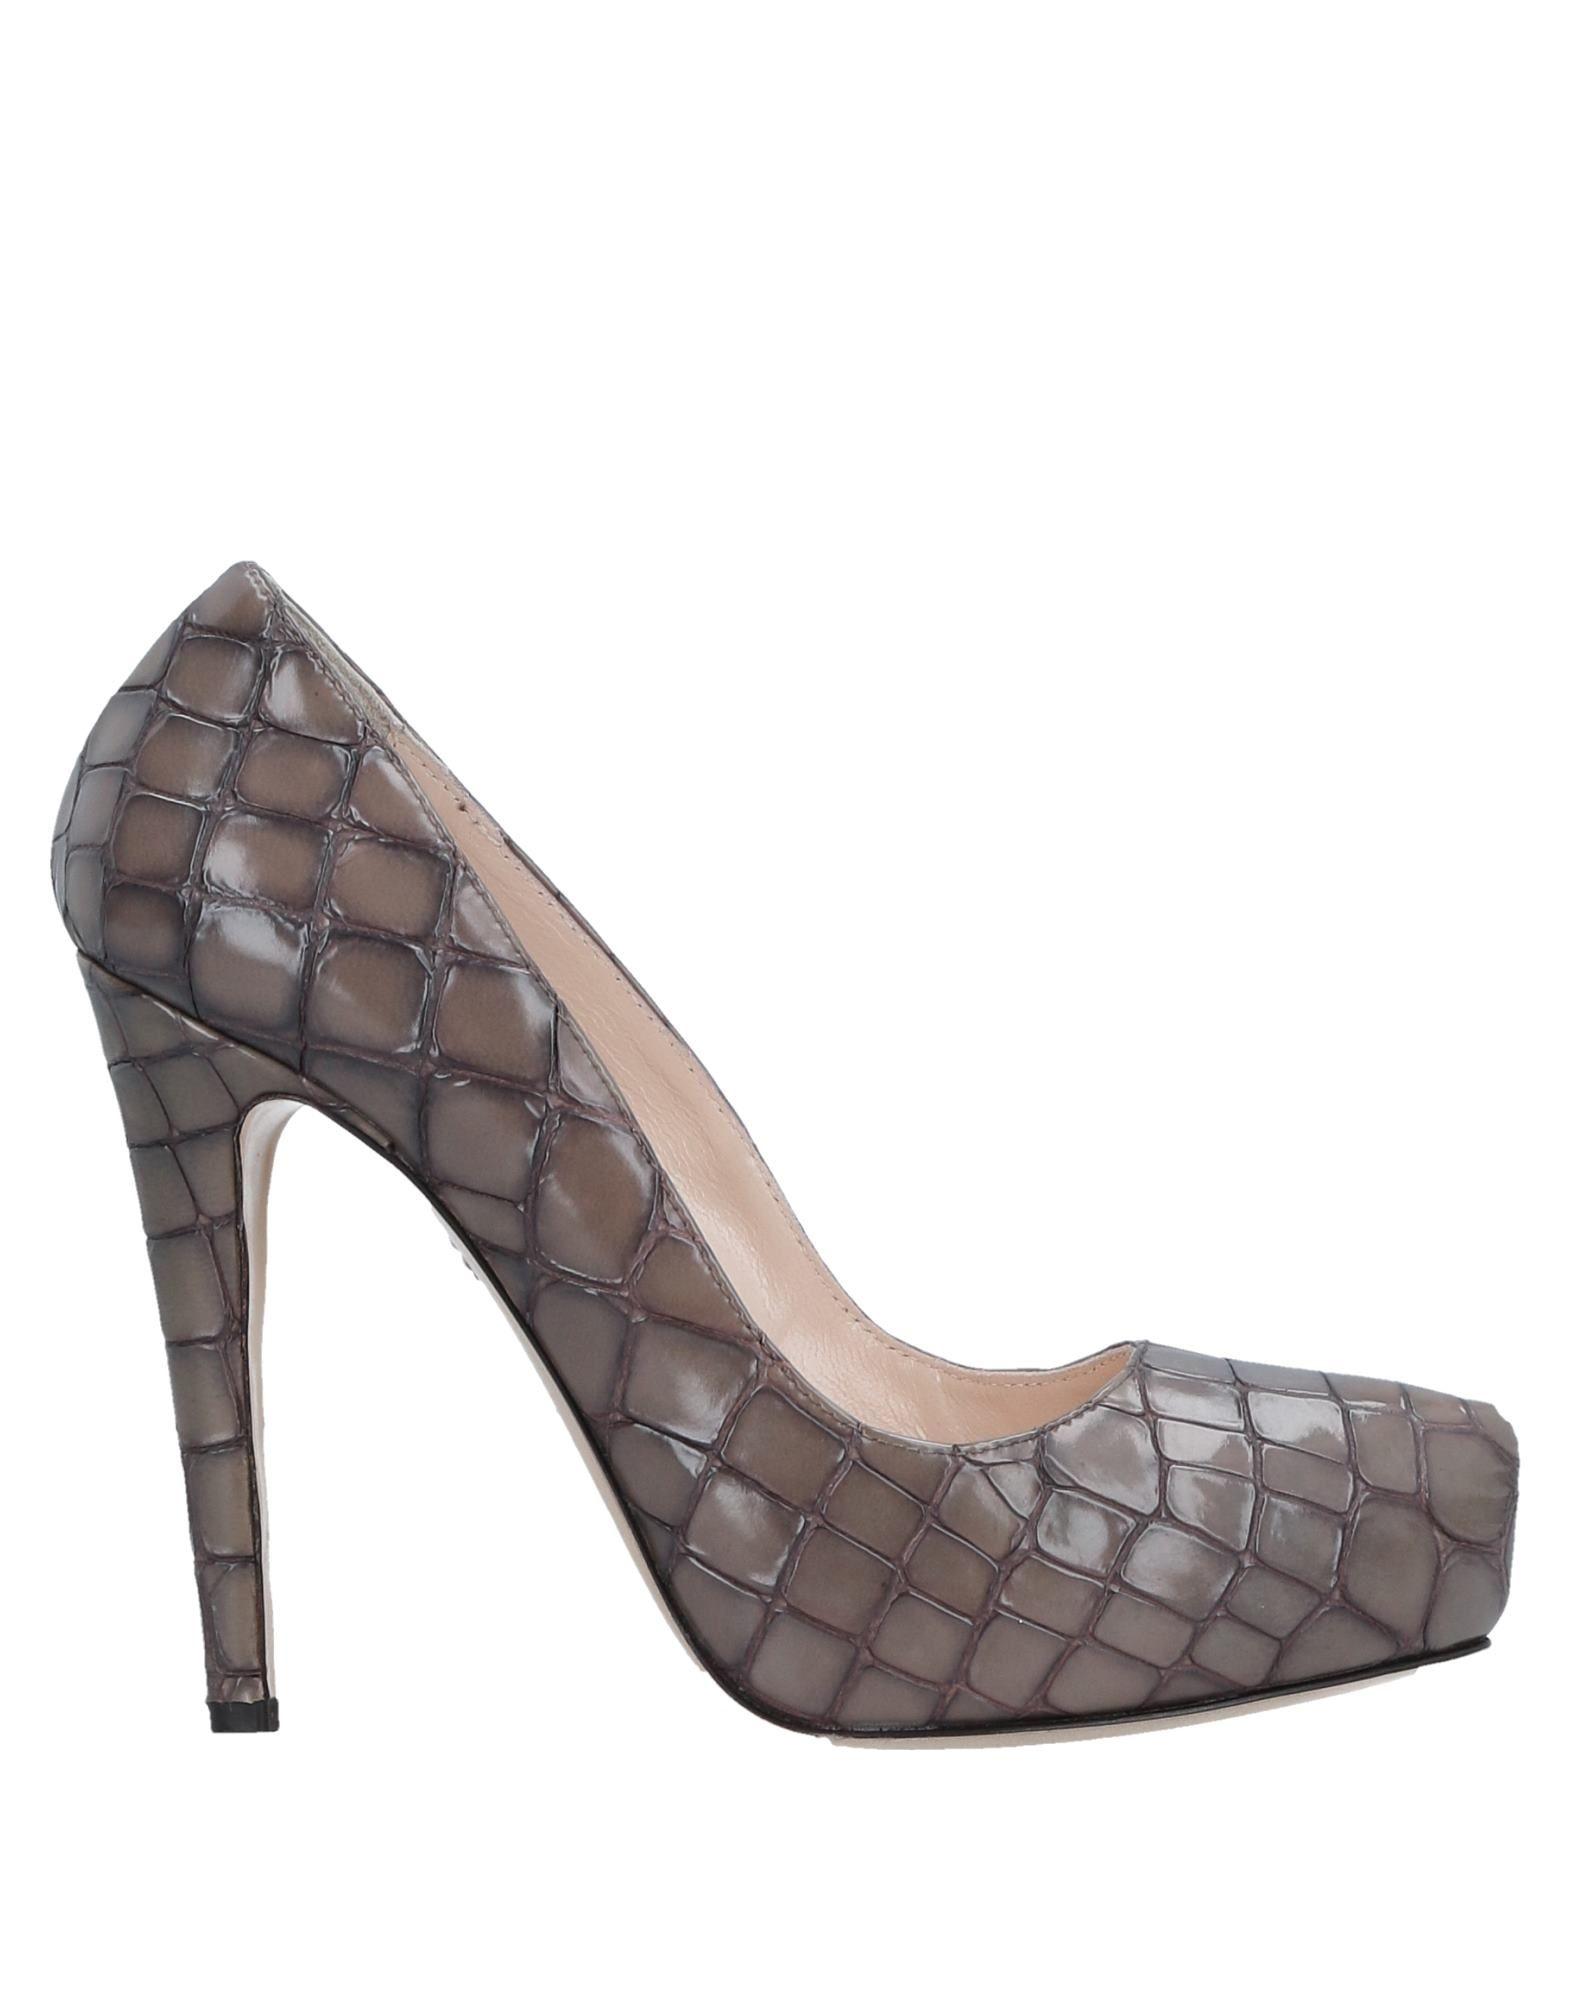 Spaziomoda Pumps Damen  11515985OV Schuhe Gute Qualität beliebte Schuhe 11515985OV 1e3d73